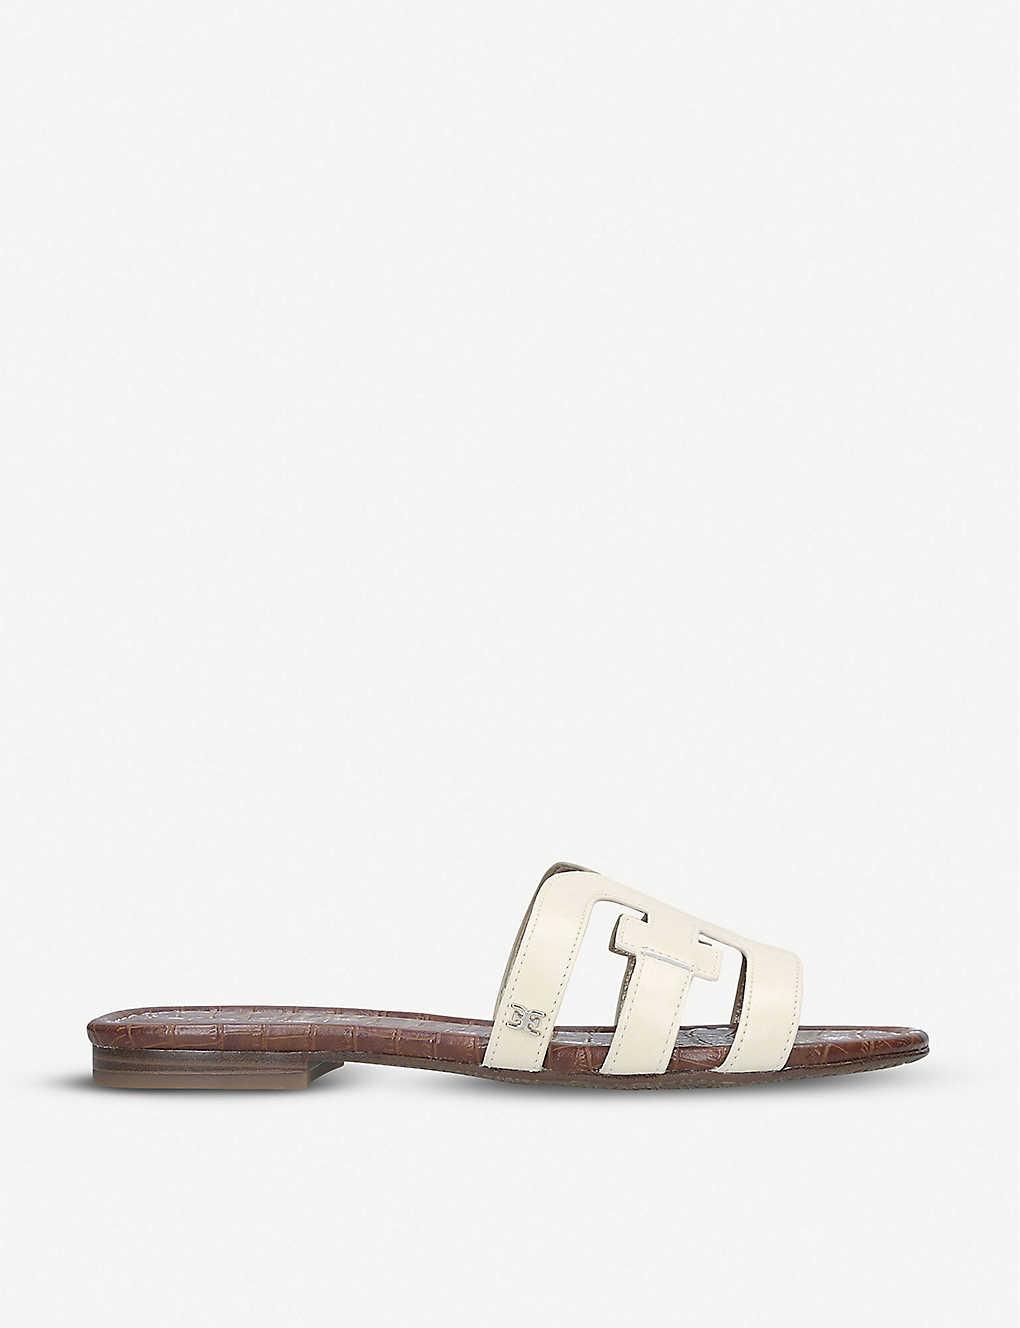 Leather Sam E Sandals Bay Double Edelman PkuTZiwOX